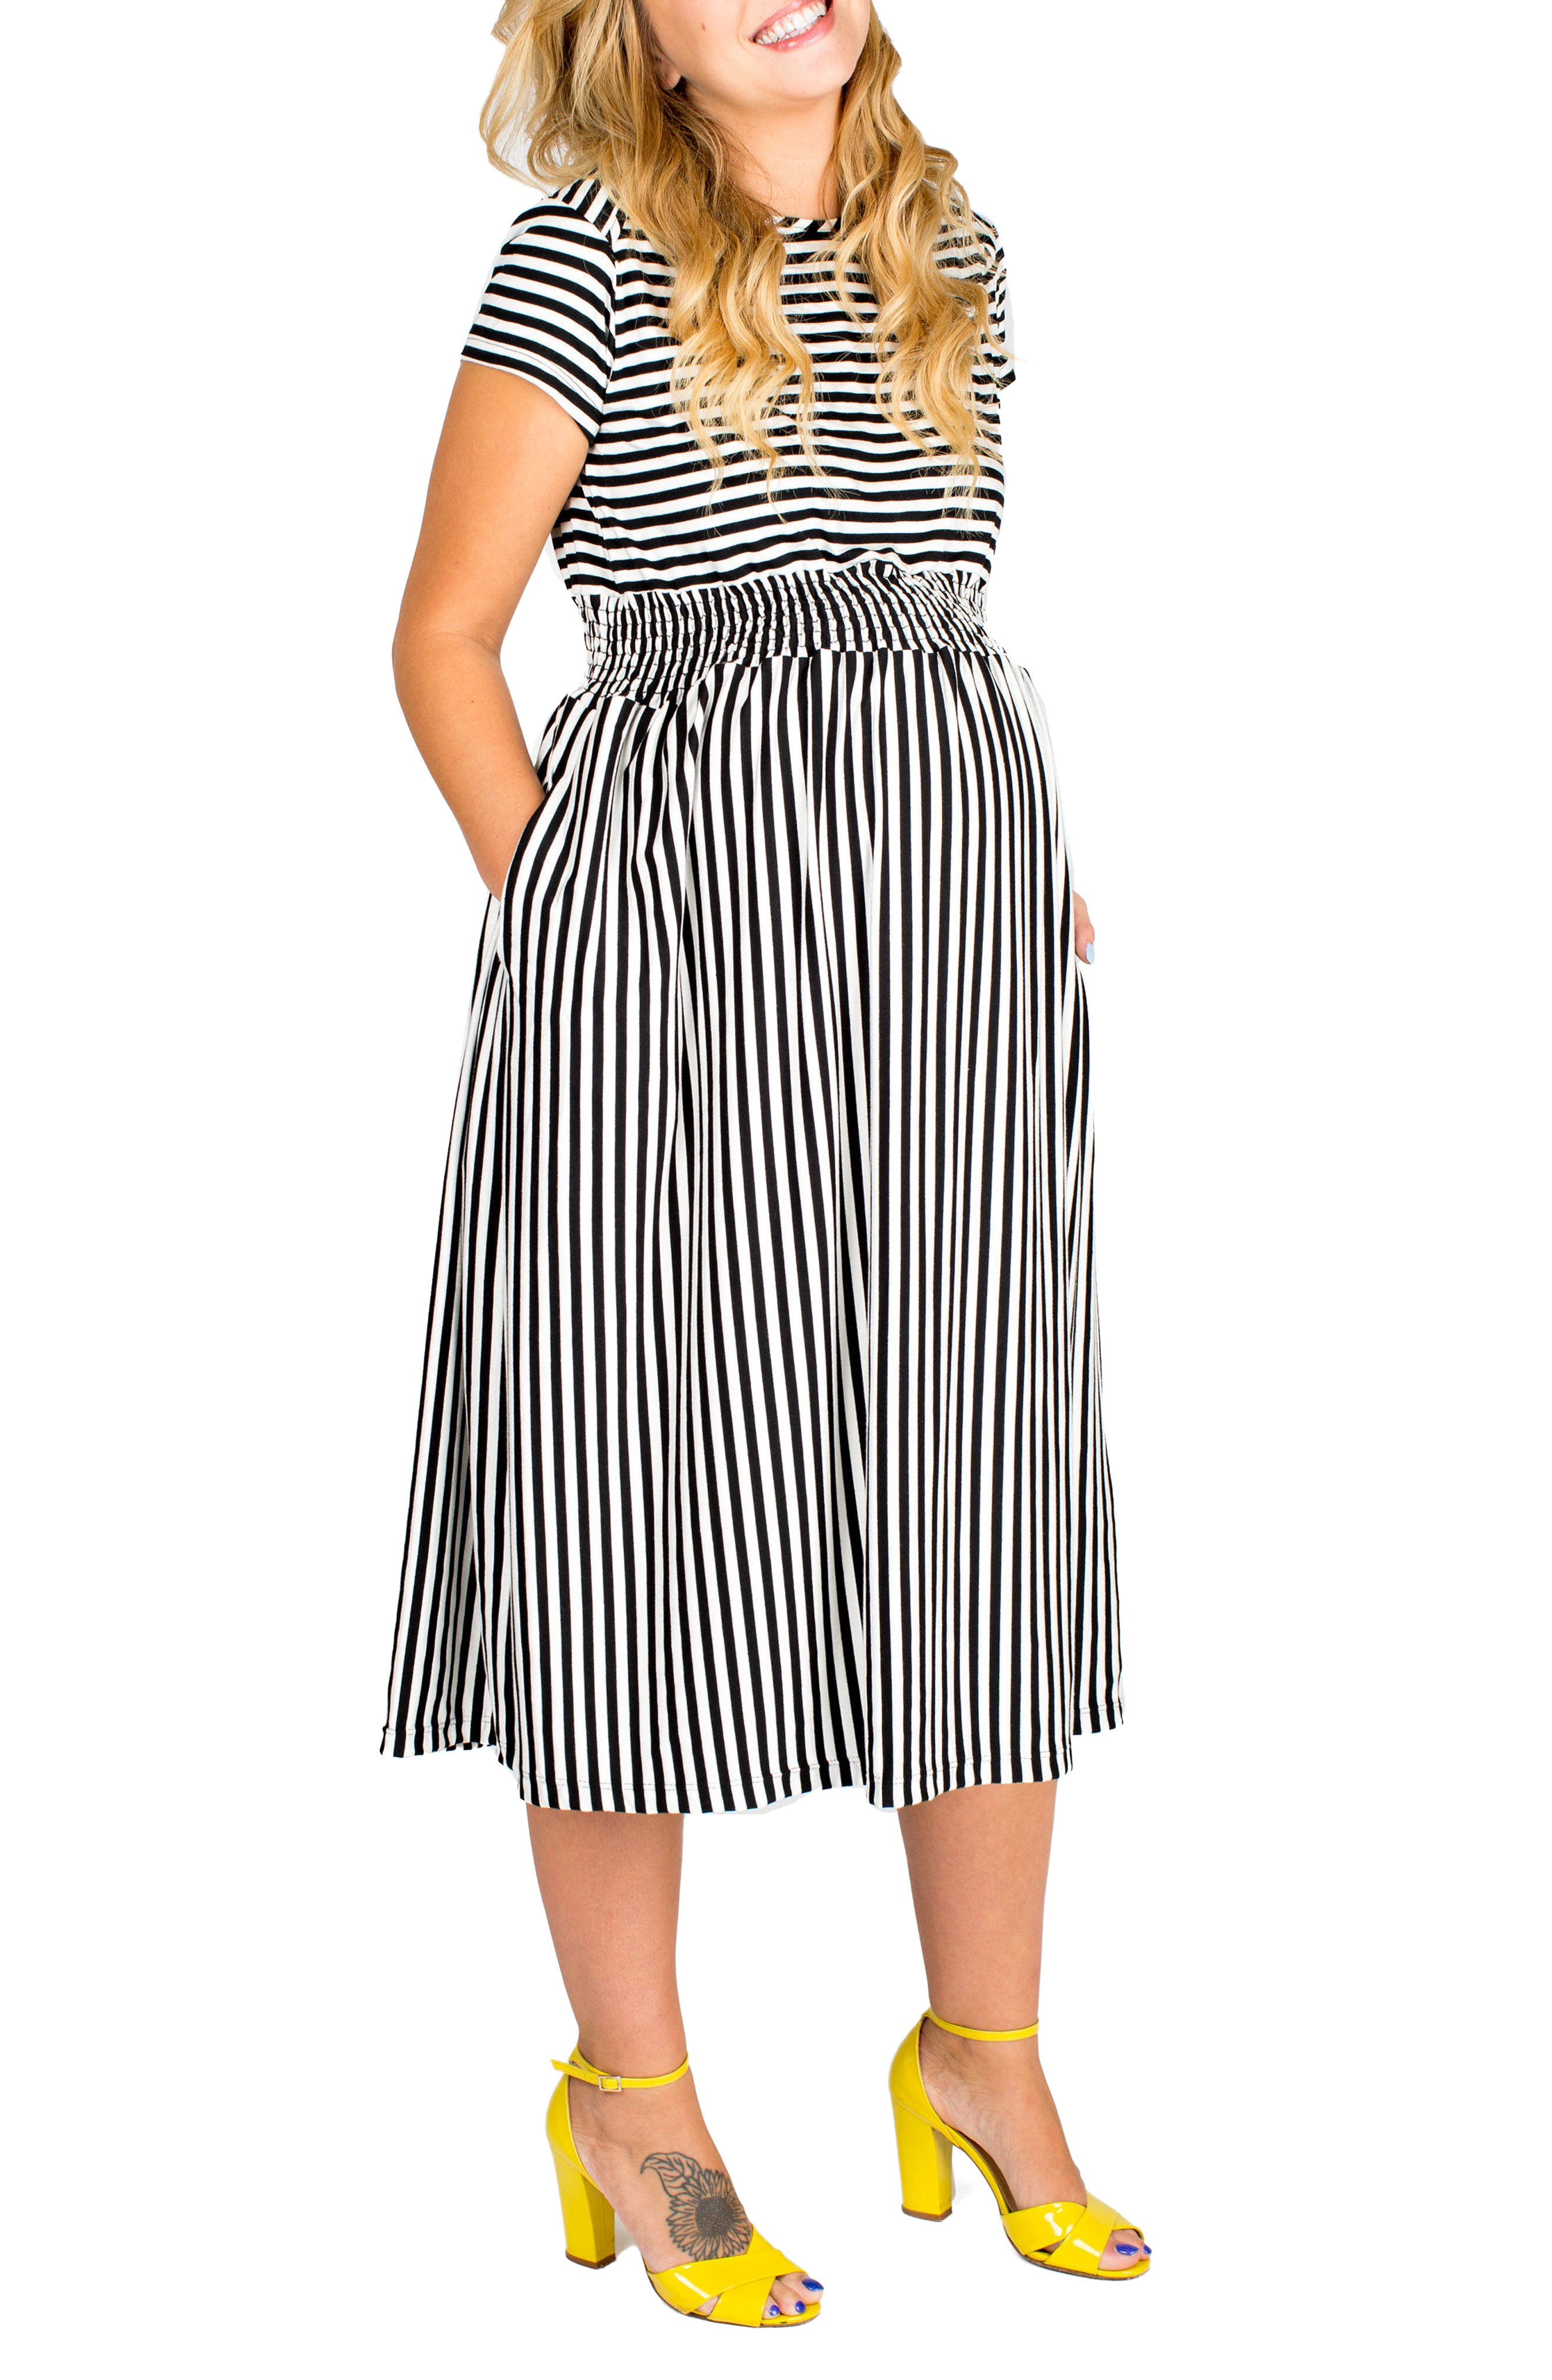 NOM MATERNITY,                             Nom 'Max' Print Midi Maternity Dress,                             Main thumbnail 1, color,                             002